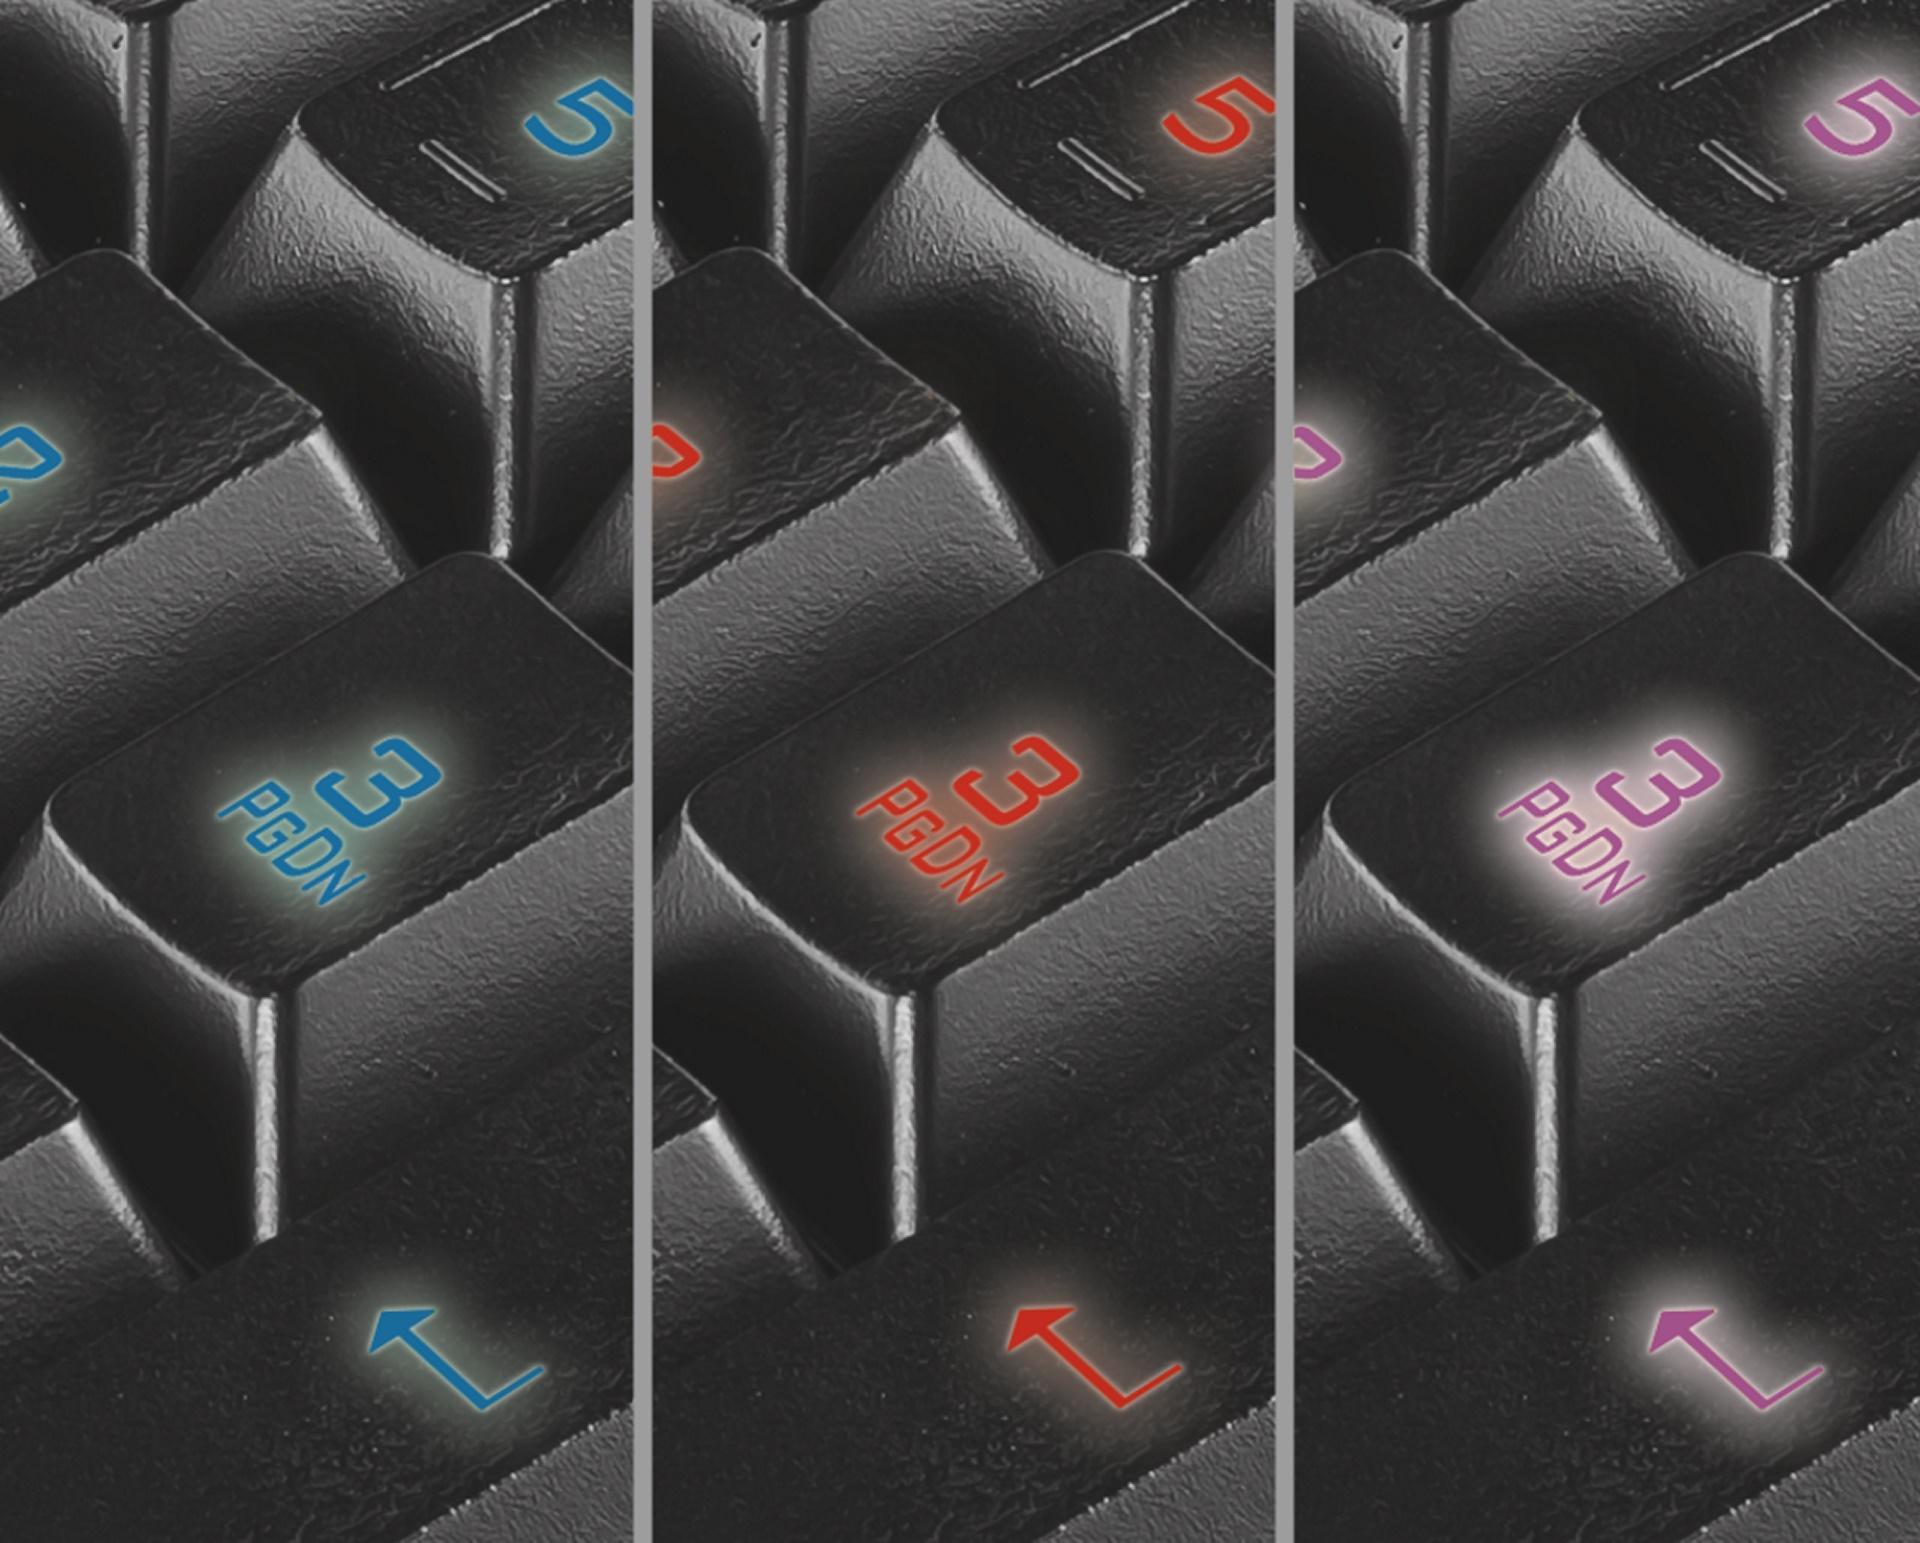 keyboard;gaming;antighosting;comfortable;led;illuminated;mediakeys